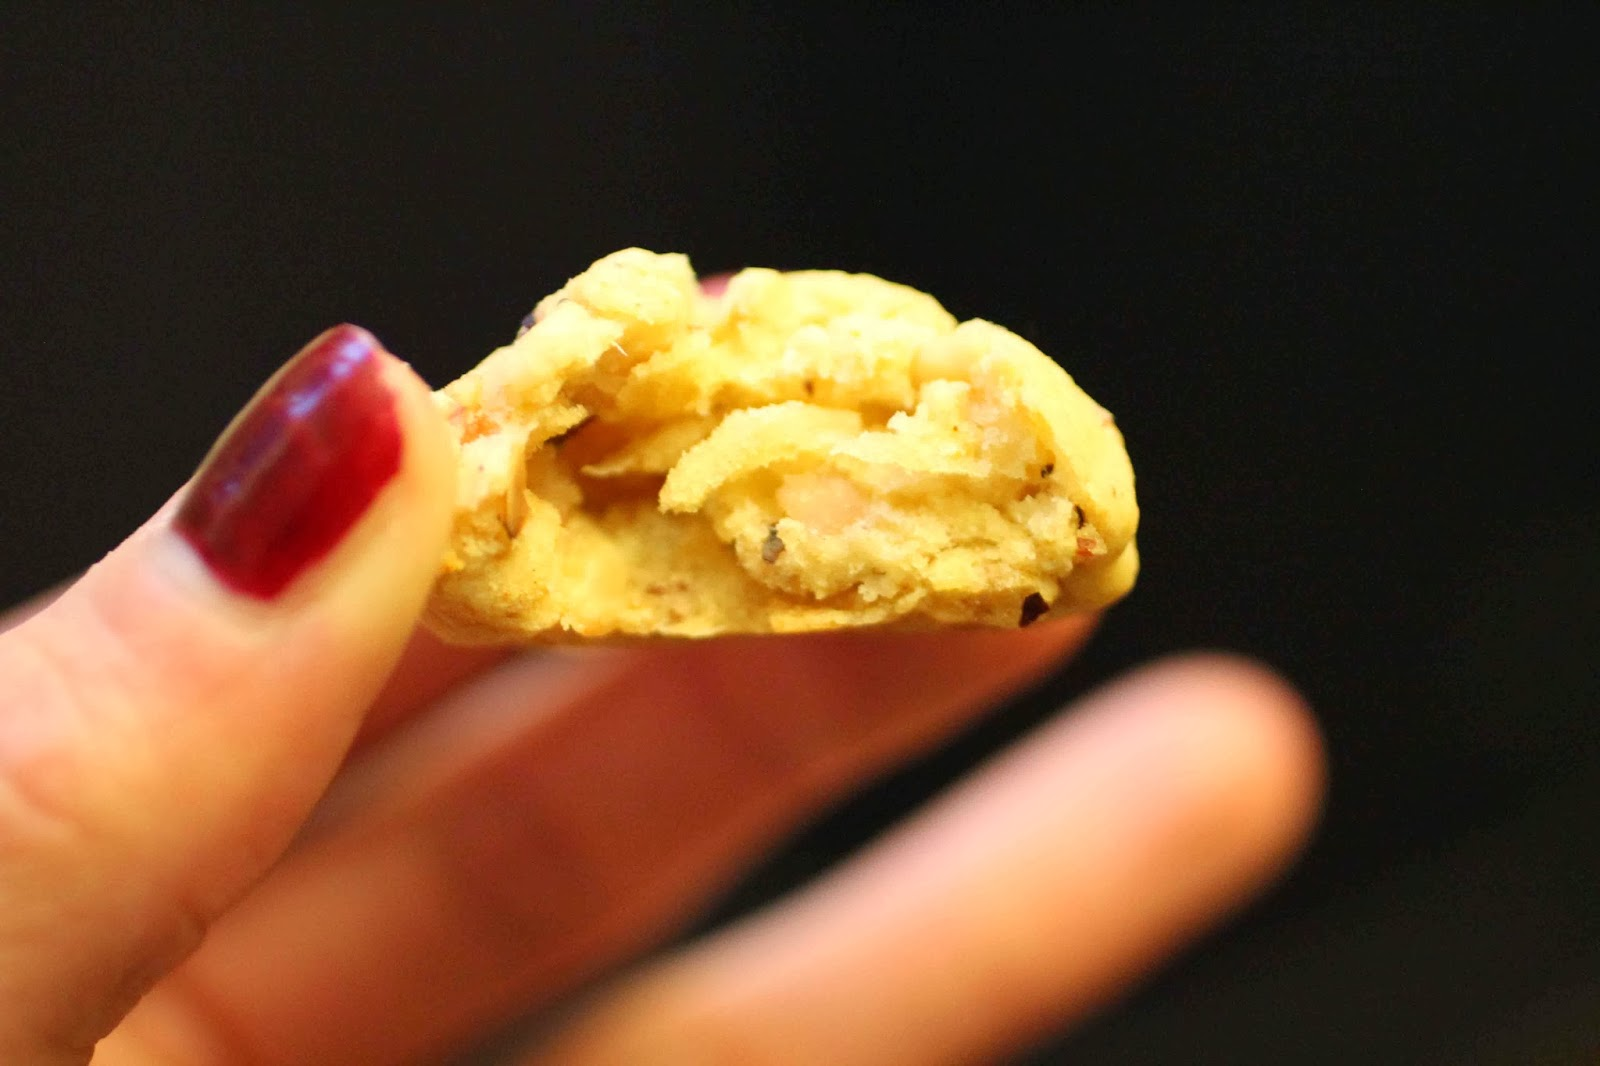 http://camilleenchocolat.blogspot.fr/2013/10/cookies-sales-au-bacon-et-noisettes.html